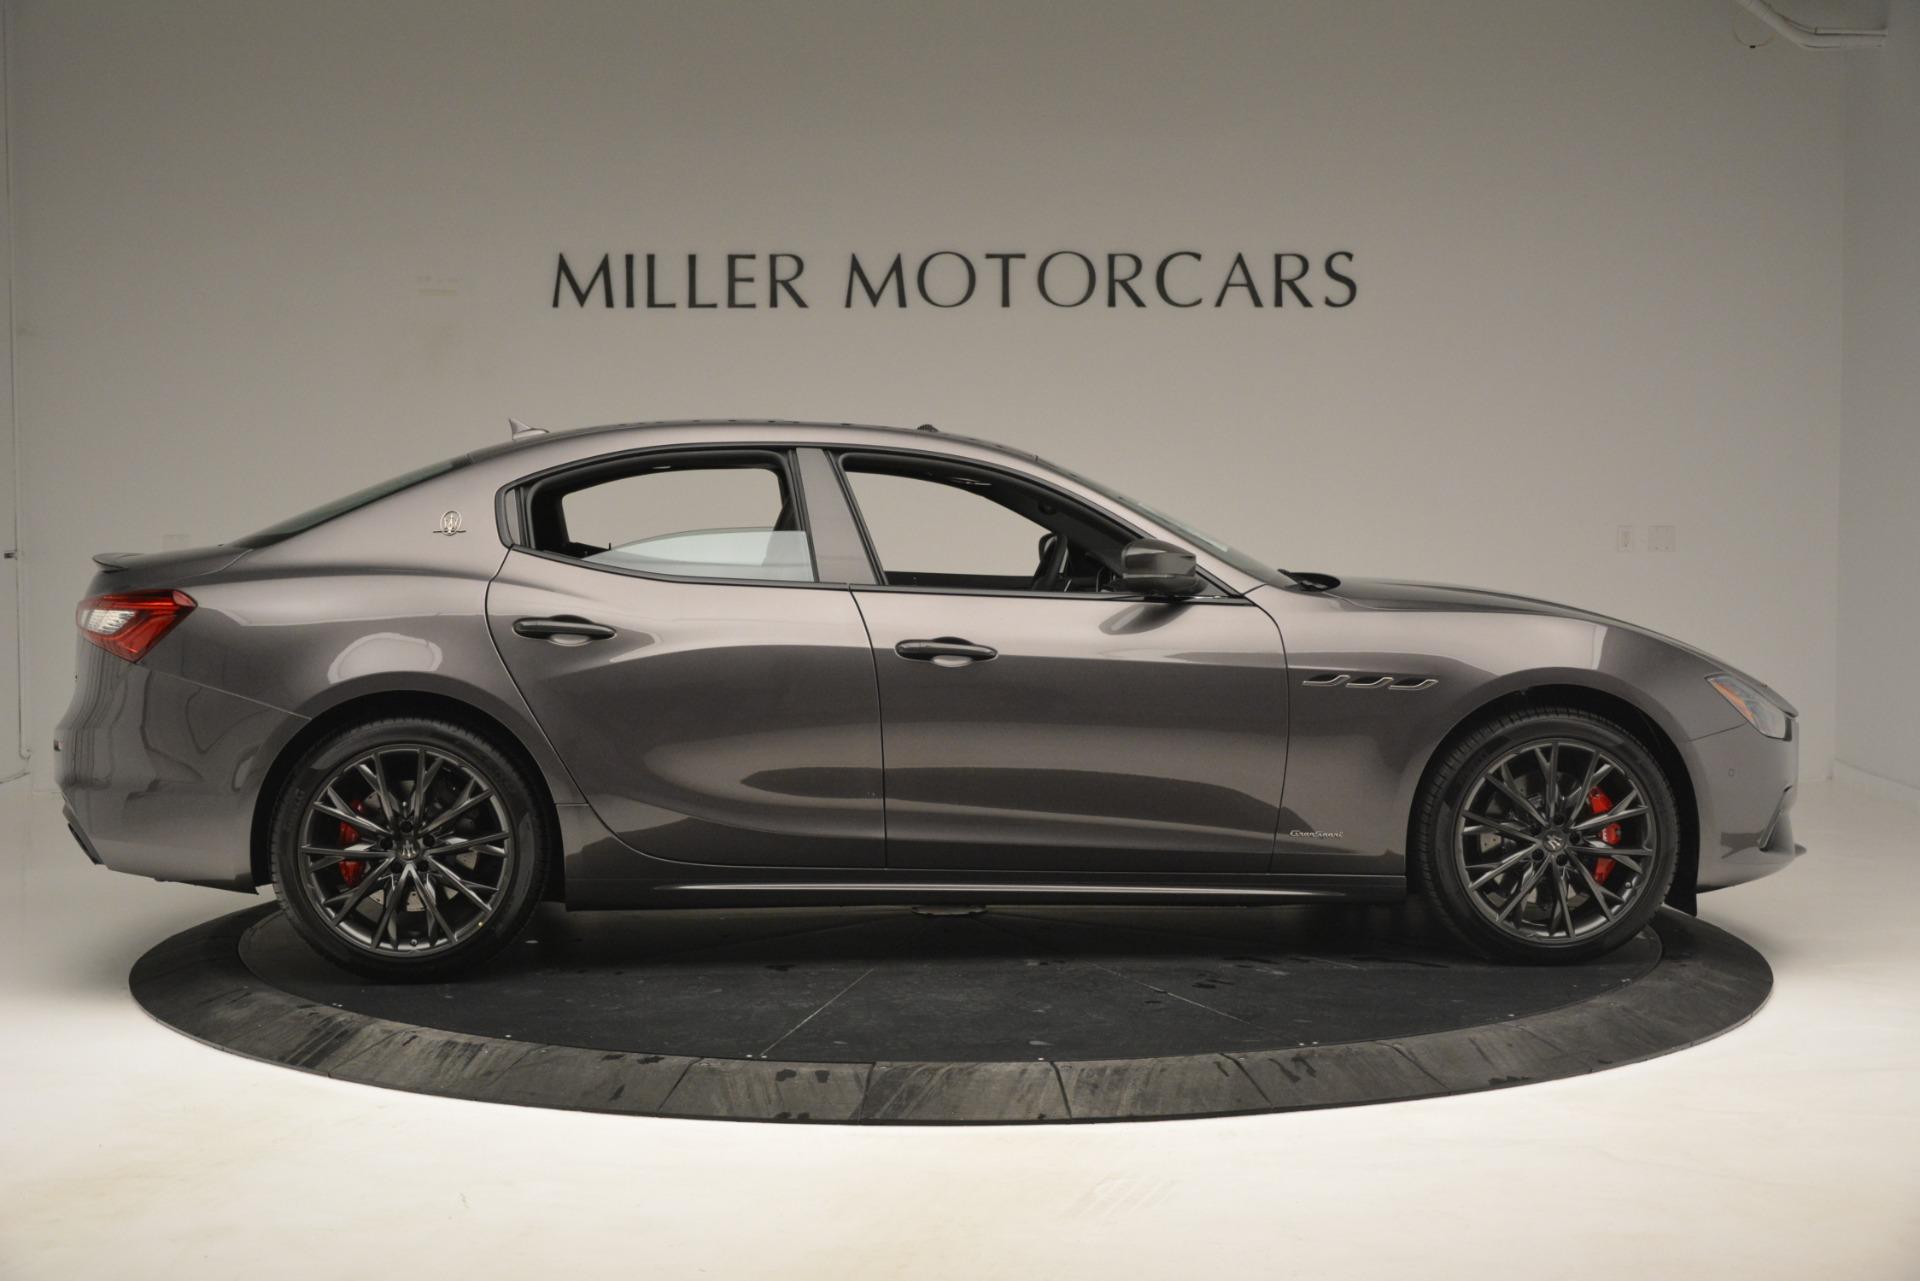 New 2019 Maserati Ghibli S Q4 GranSport For Sale In Greenwich, CT 2925_p10